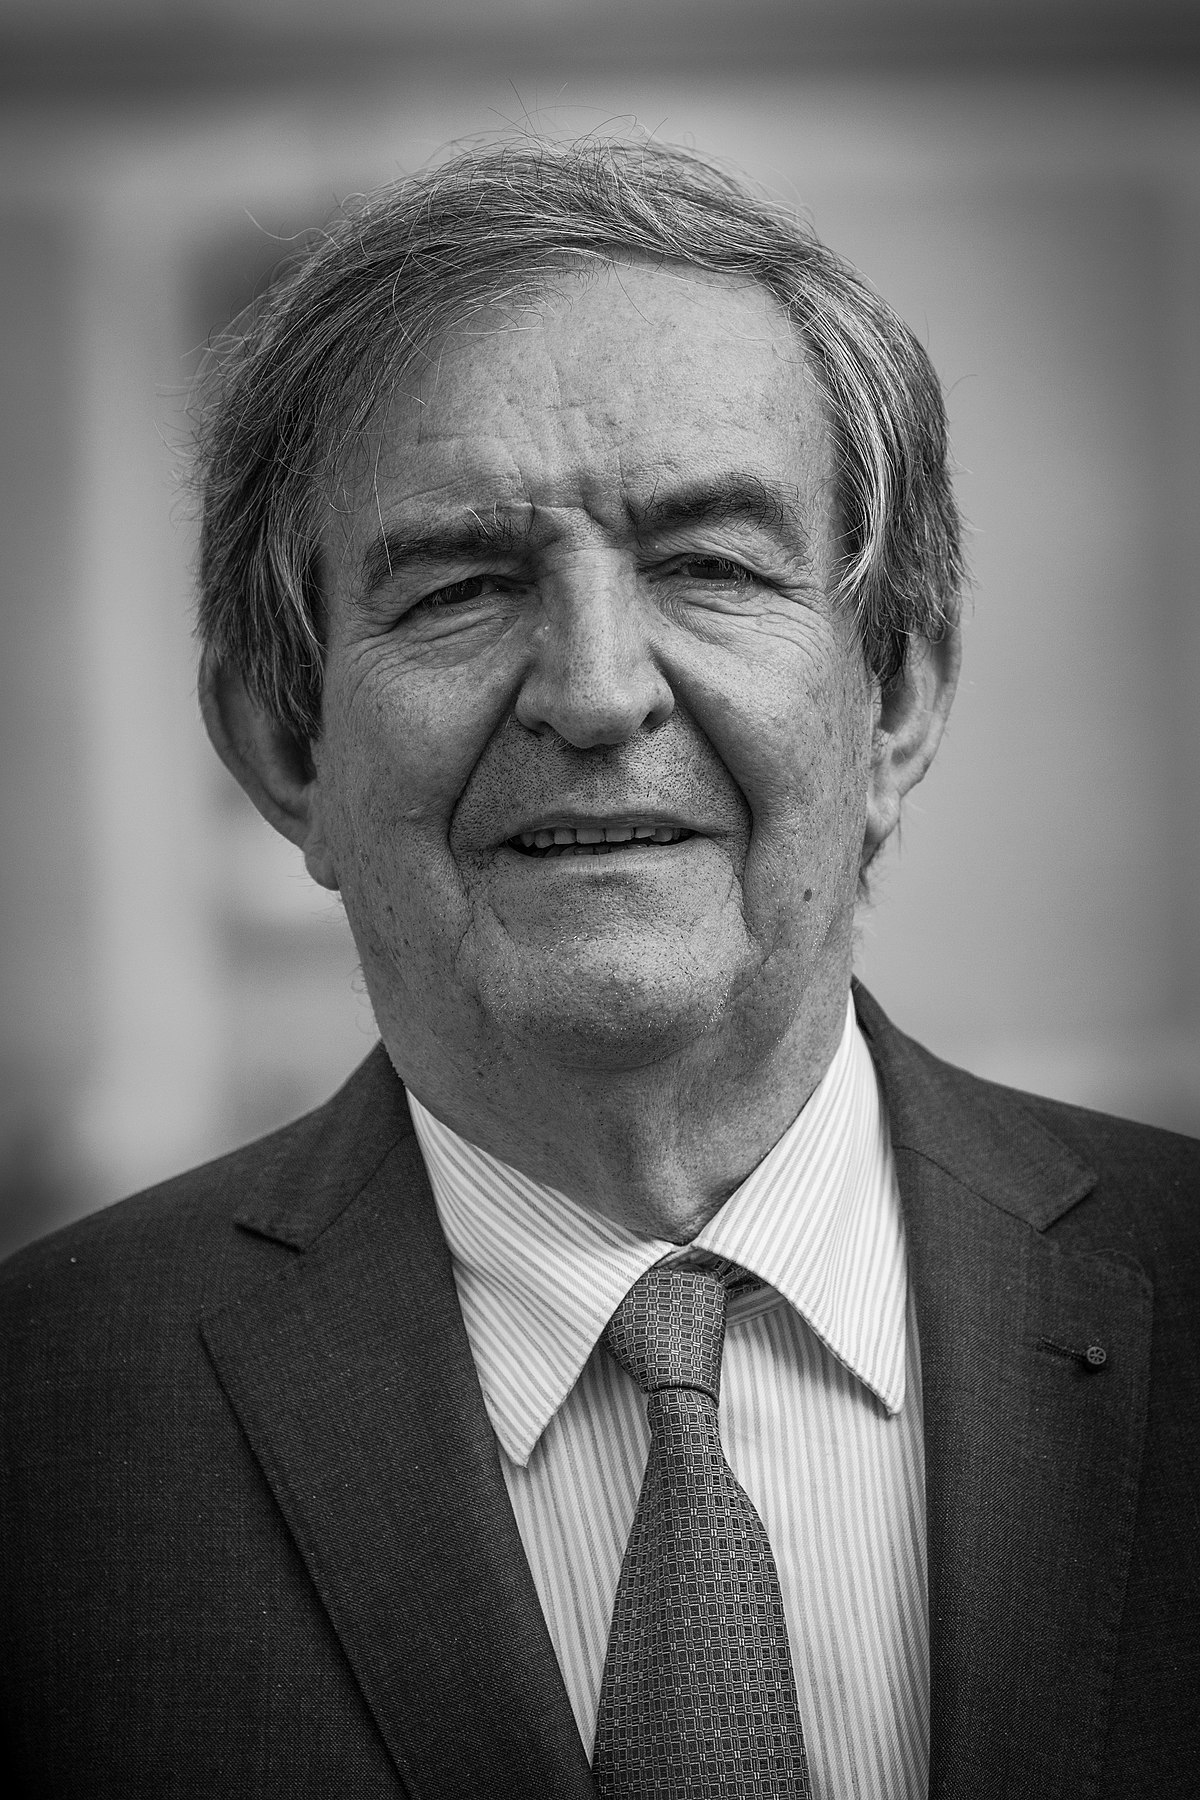 Jean Louis Sabaji Summer 2014: Jean-Louis Bruguière